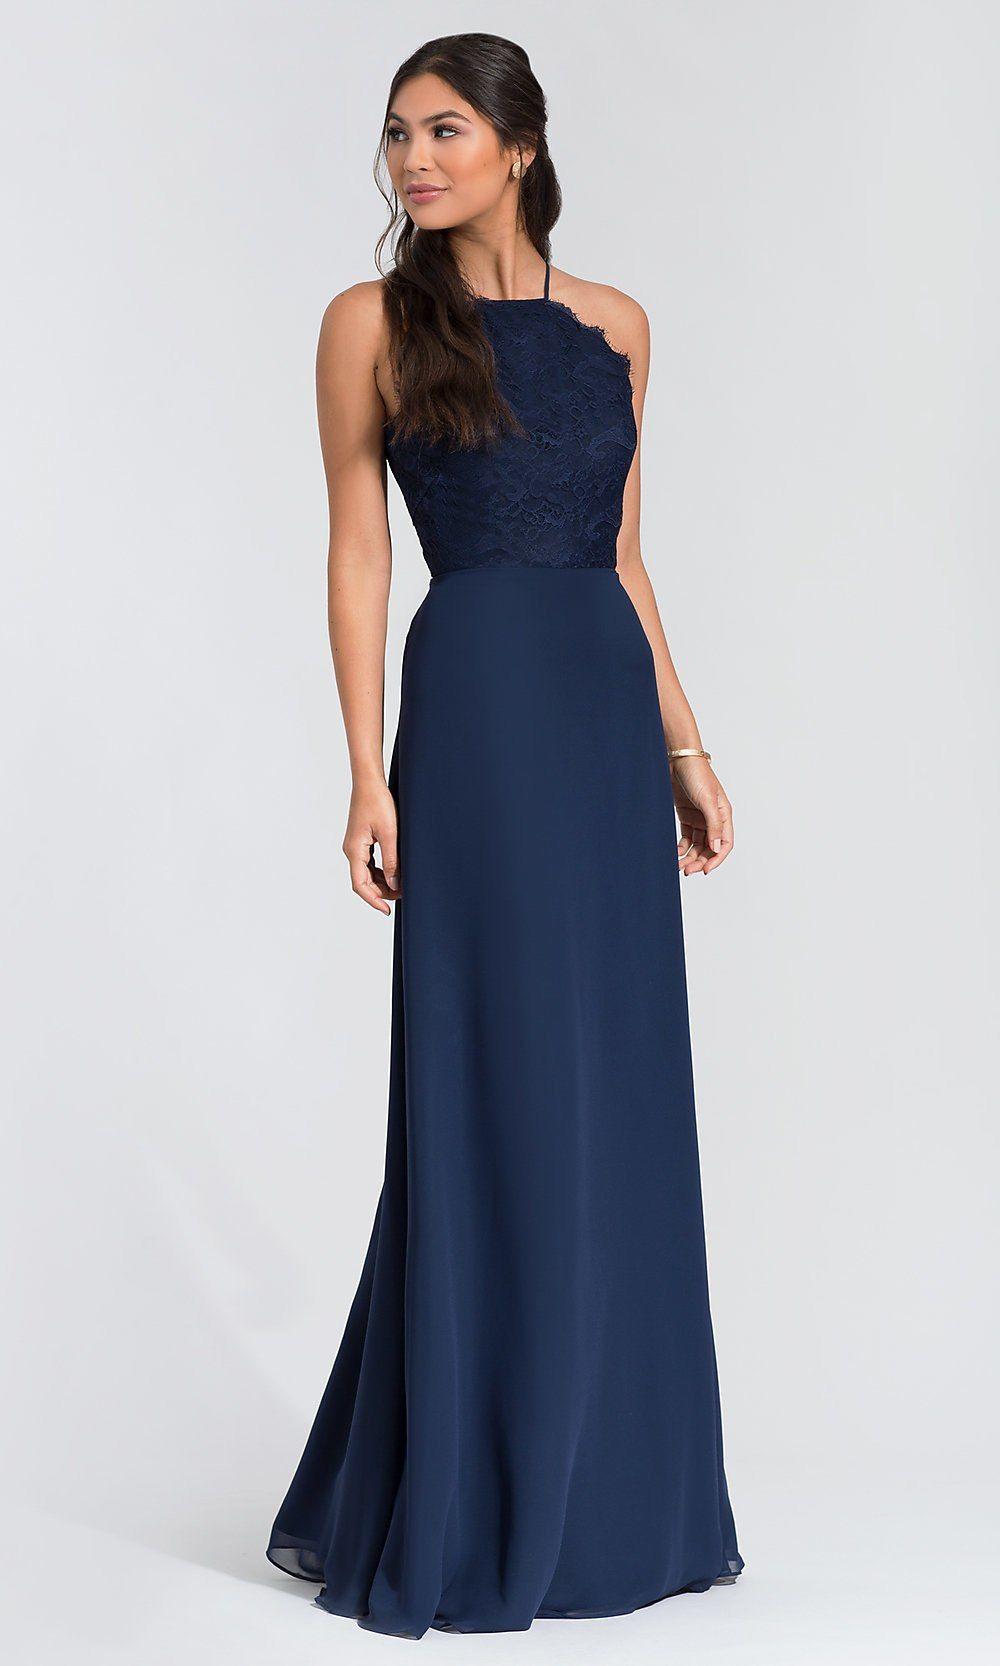 Lacebodice hayley paige long bridesmaid dress bridesmaid dress